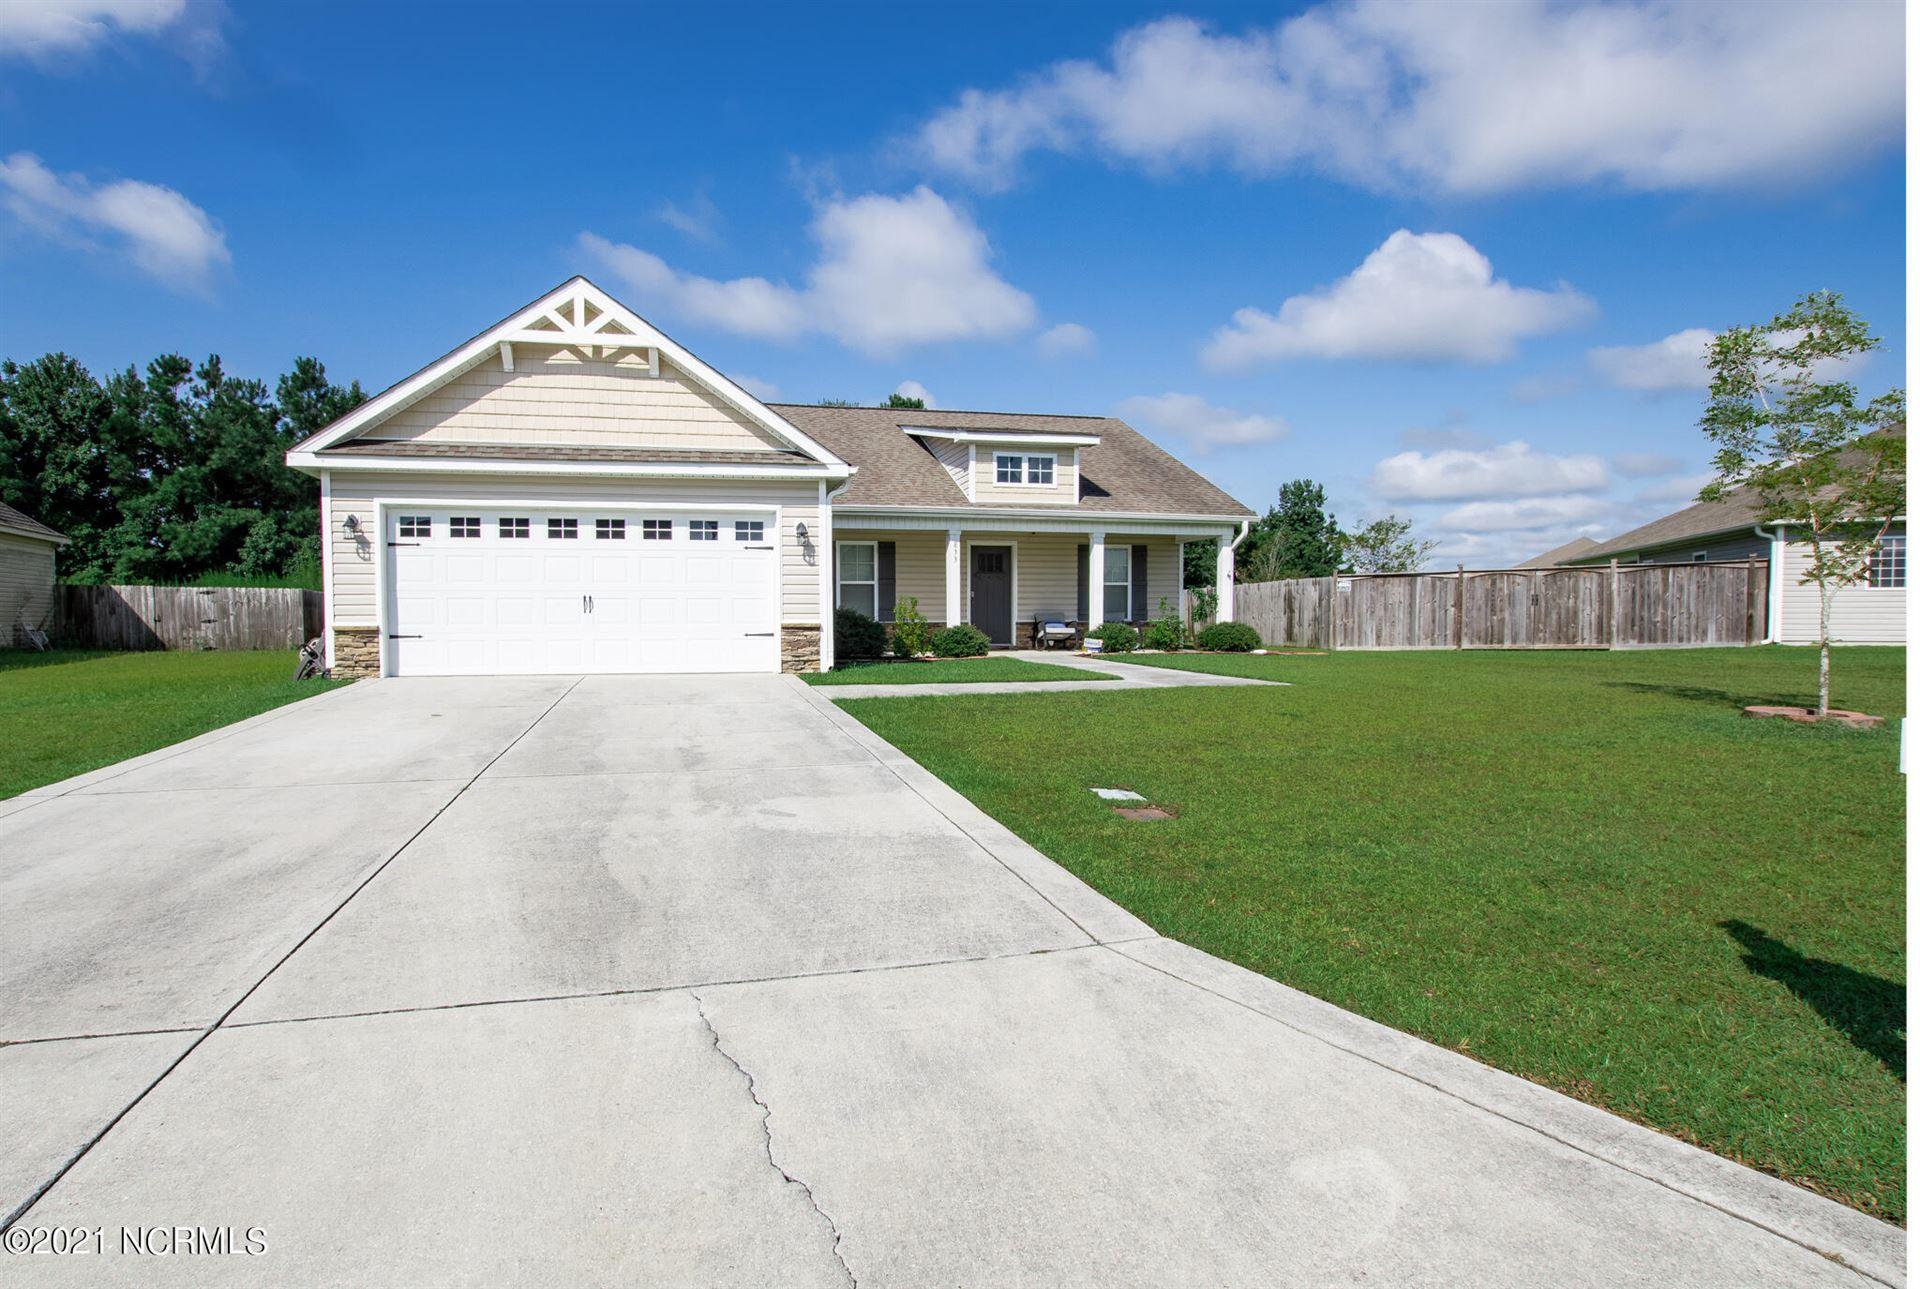 Photo of 833 Solomon Drive, Jacksonville, NC 28546 (MLS # 100287330)